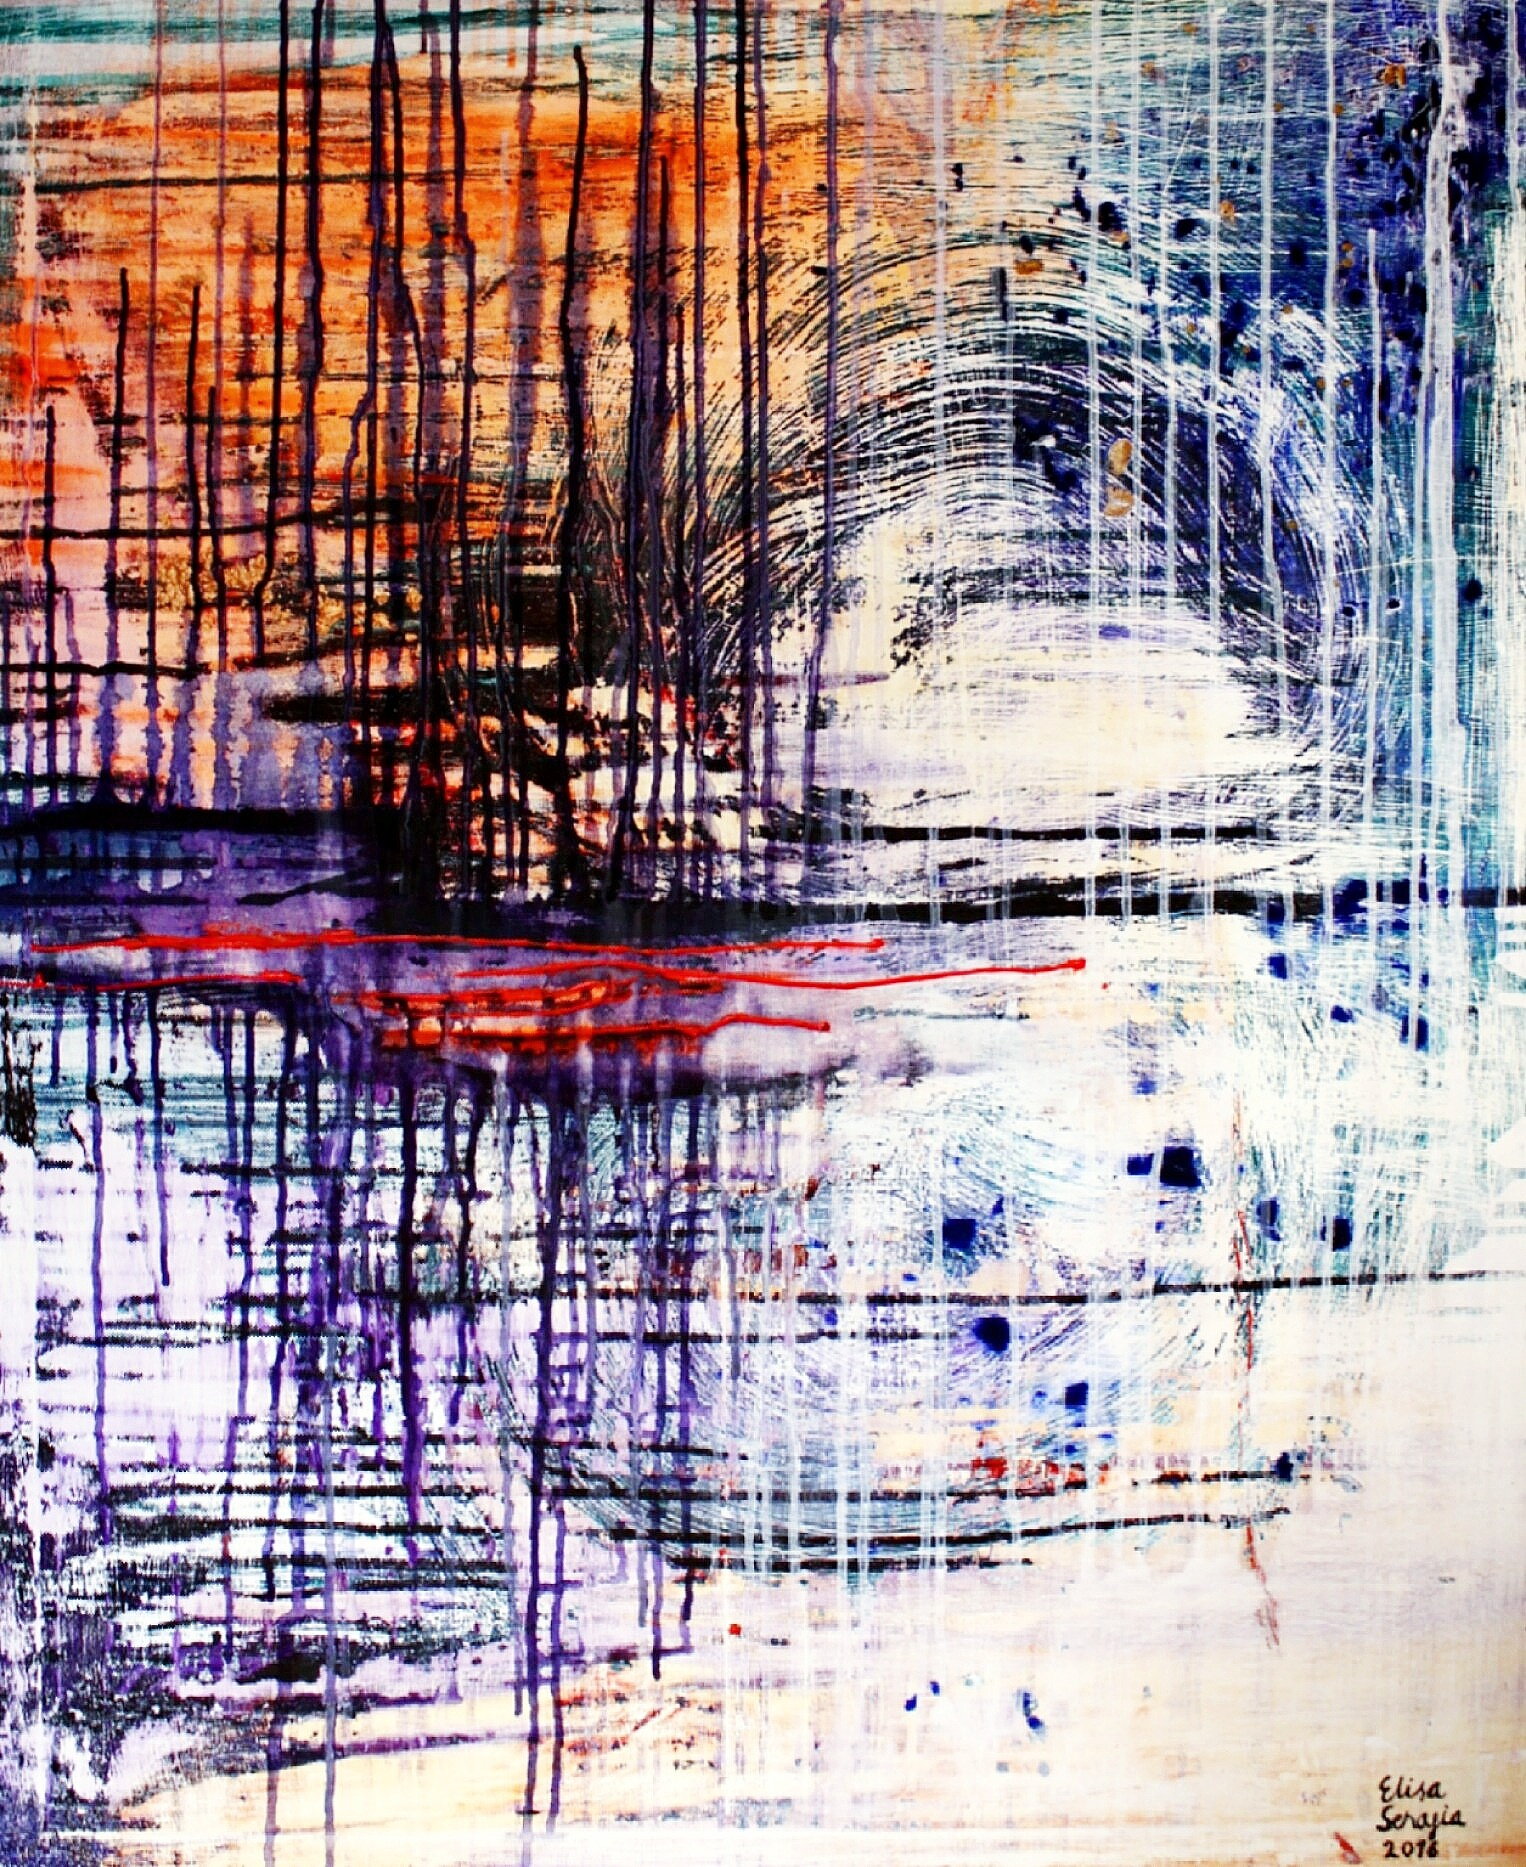 Heijastuksesi on aamun rusko, Akryyli kankaalle, 100 cm x 80 cm  Myyty / Sold